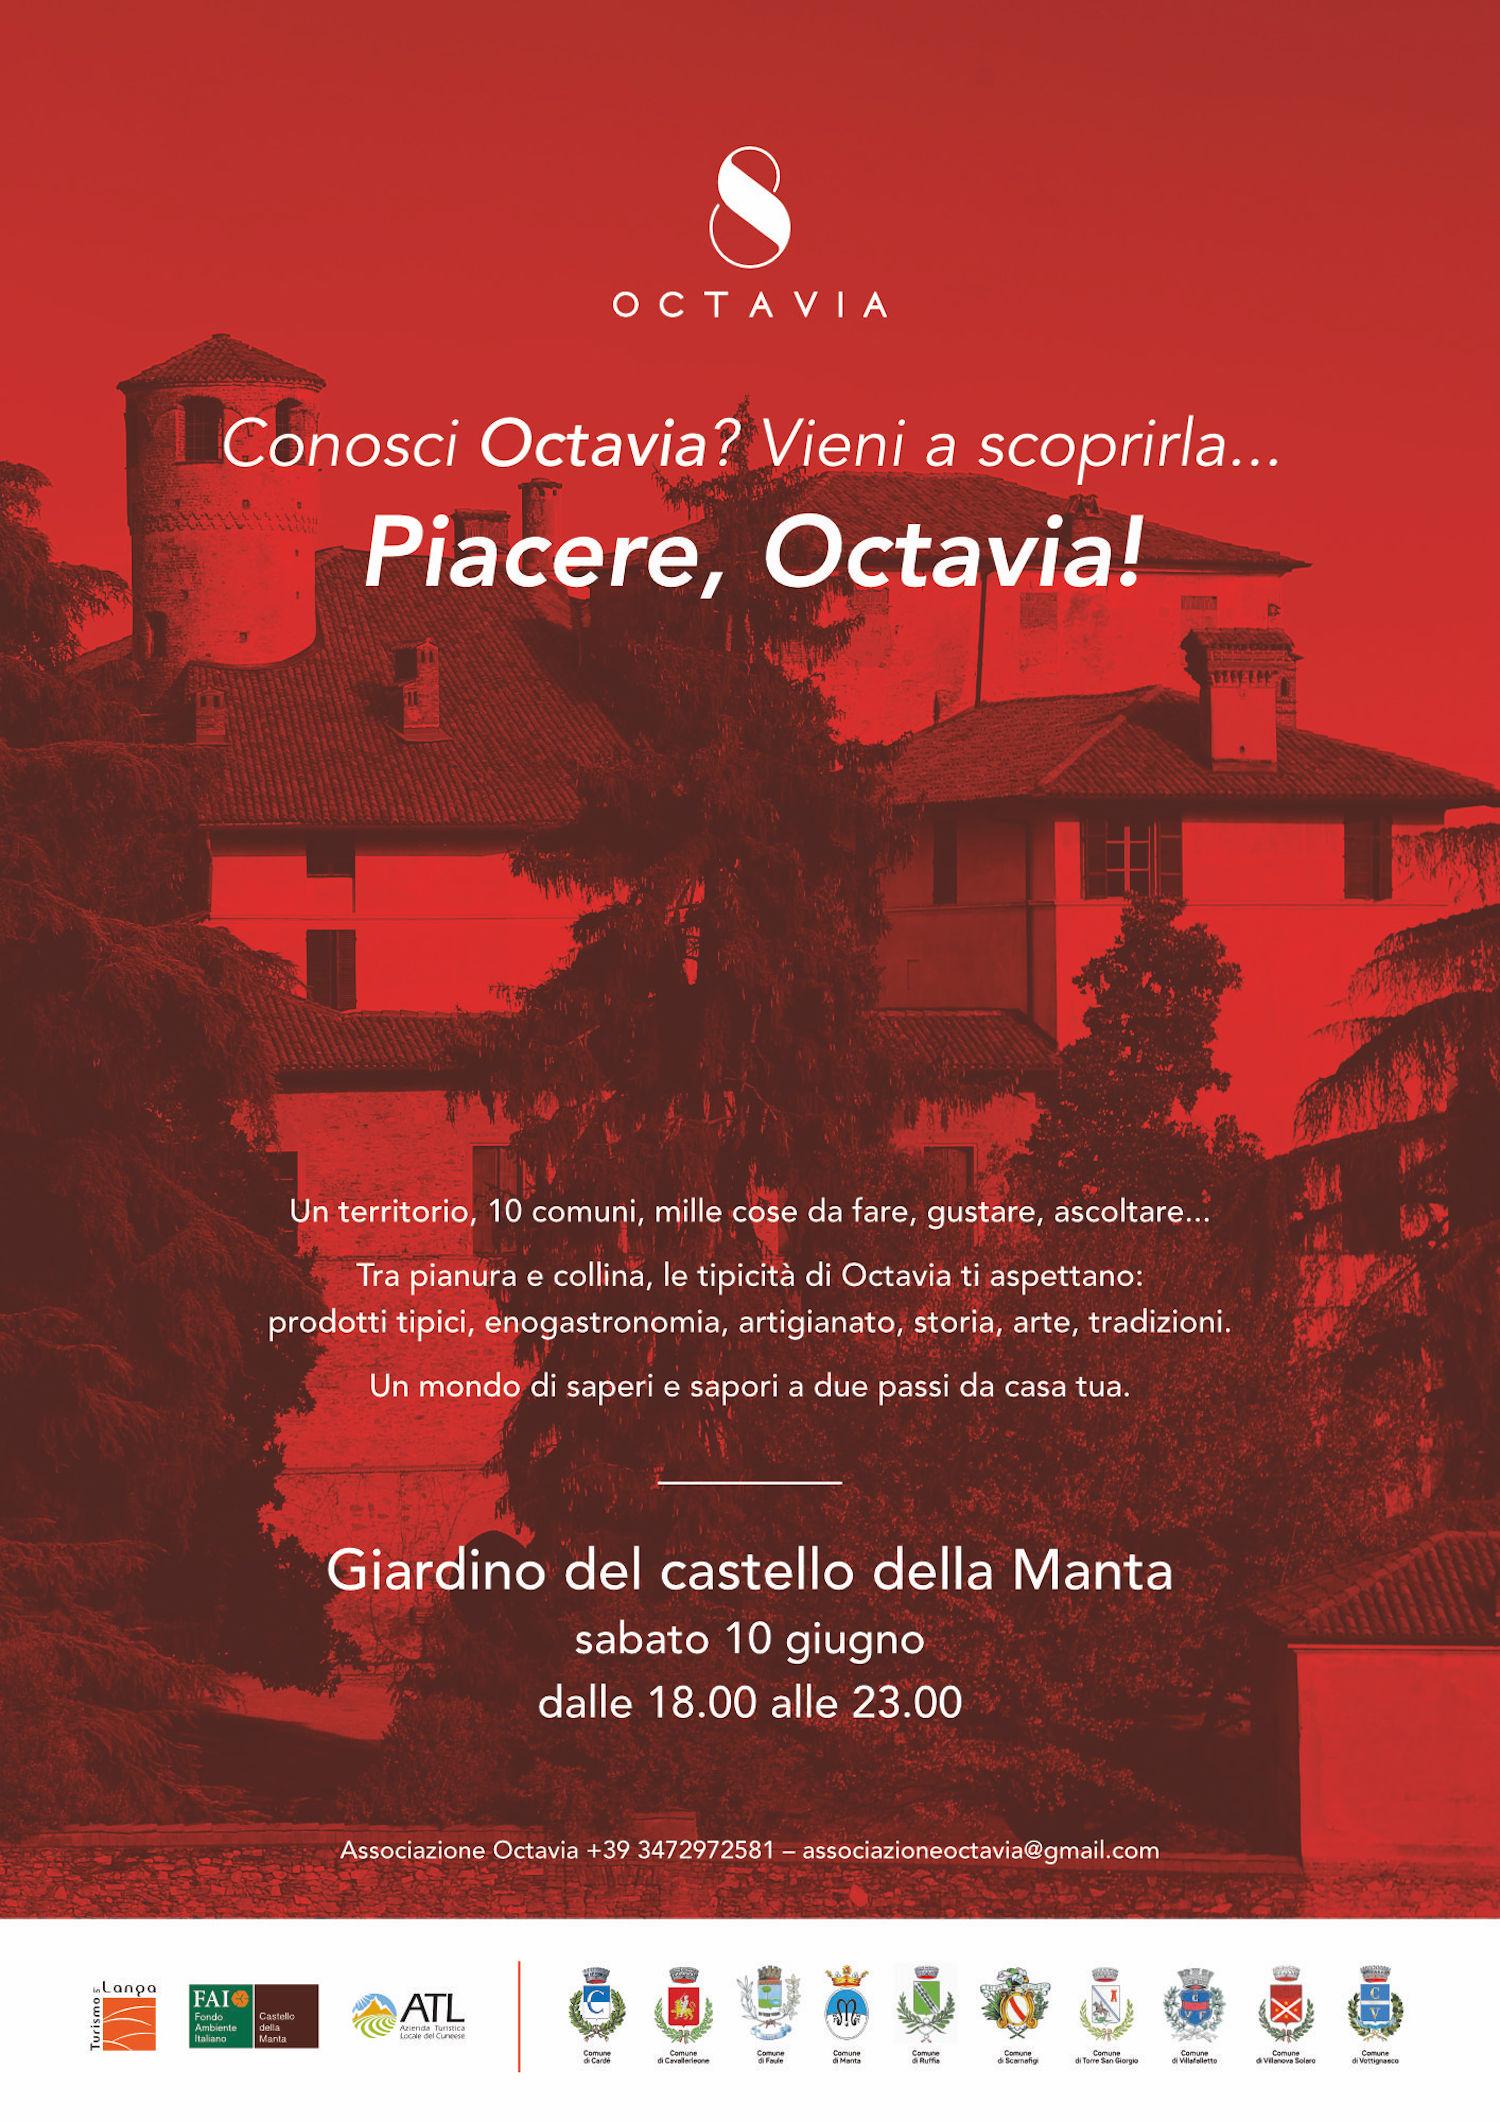 octavia-A3-low